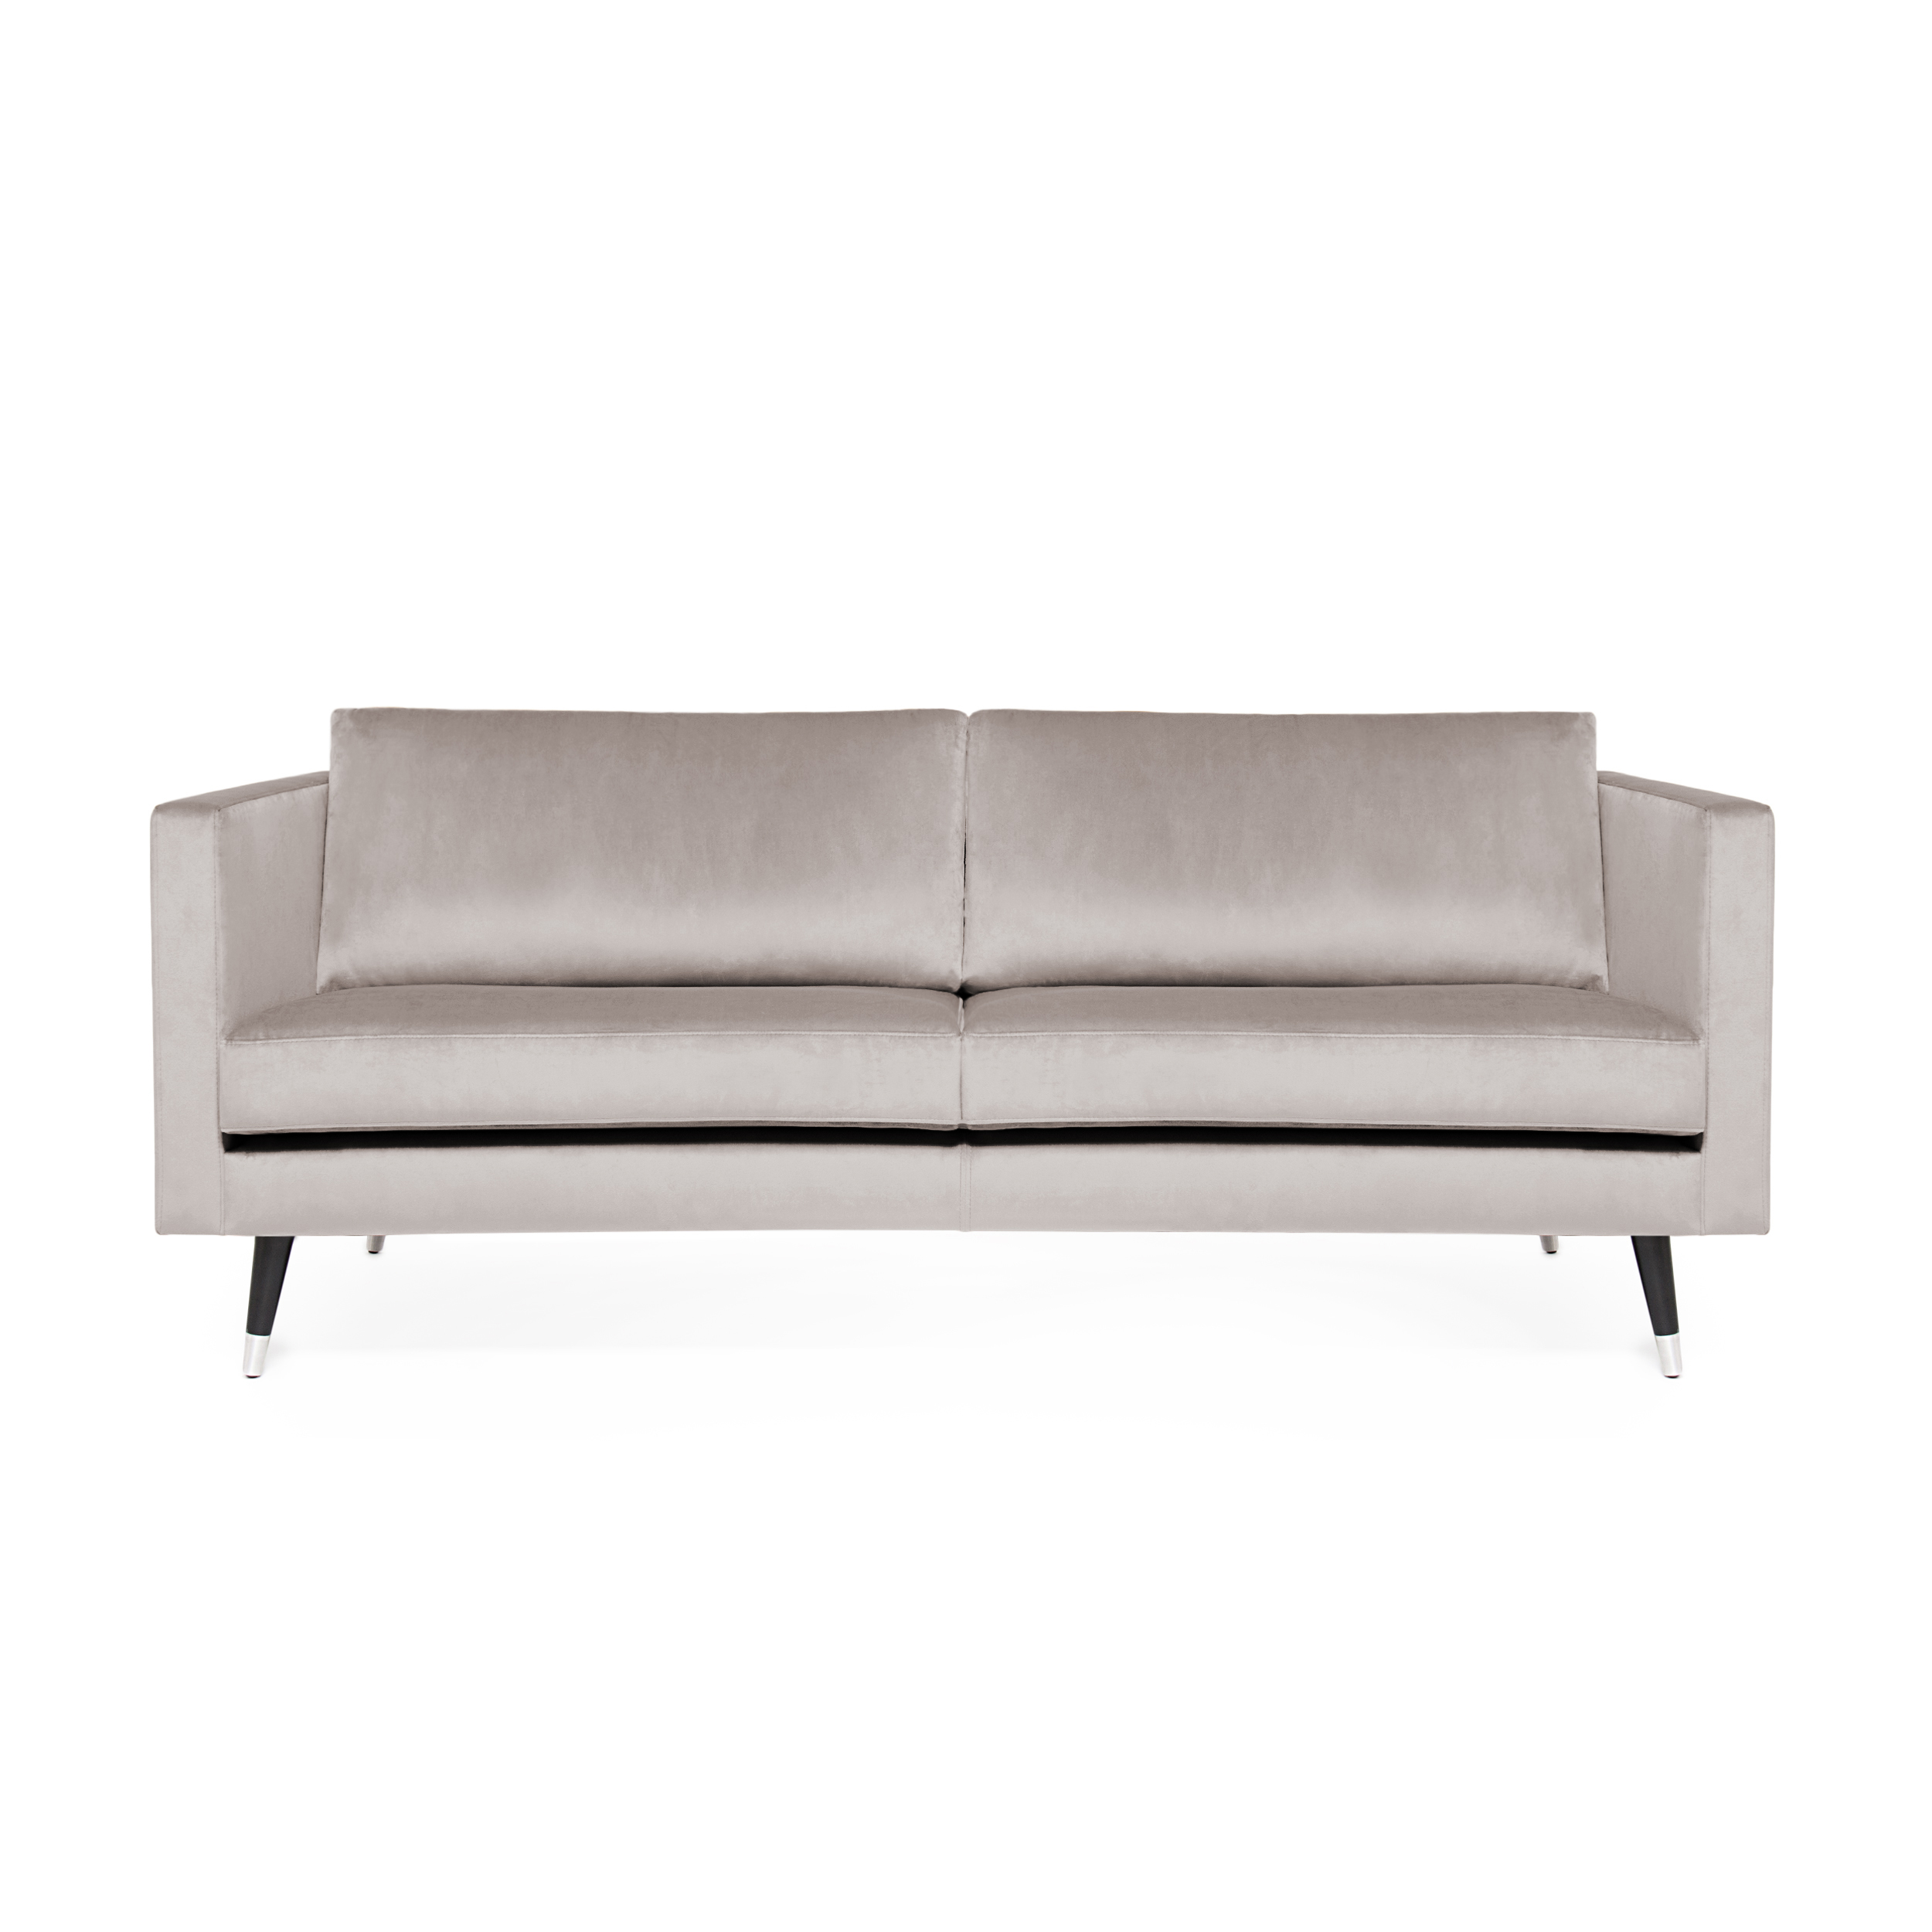 Canapea 2 locuri Meyer Velvet Light Grey/Silver